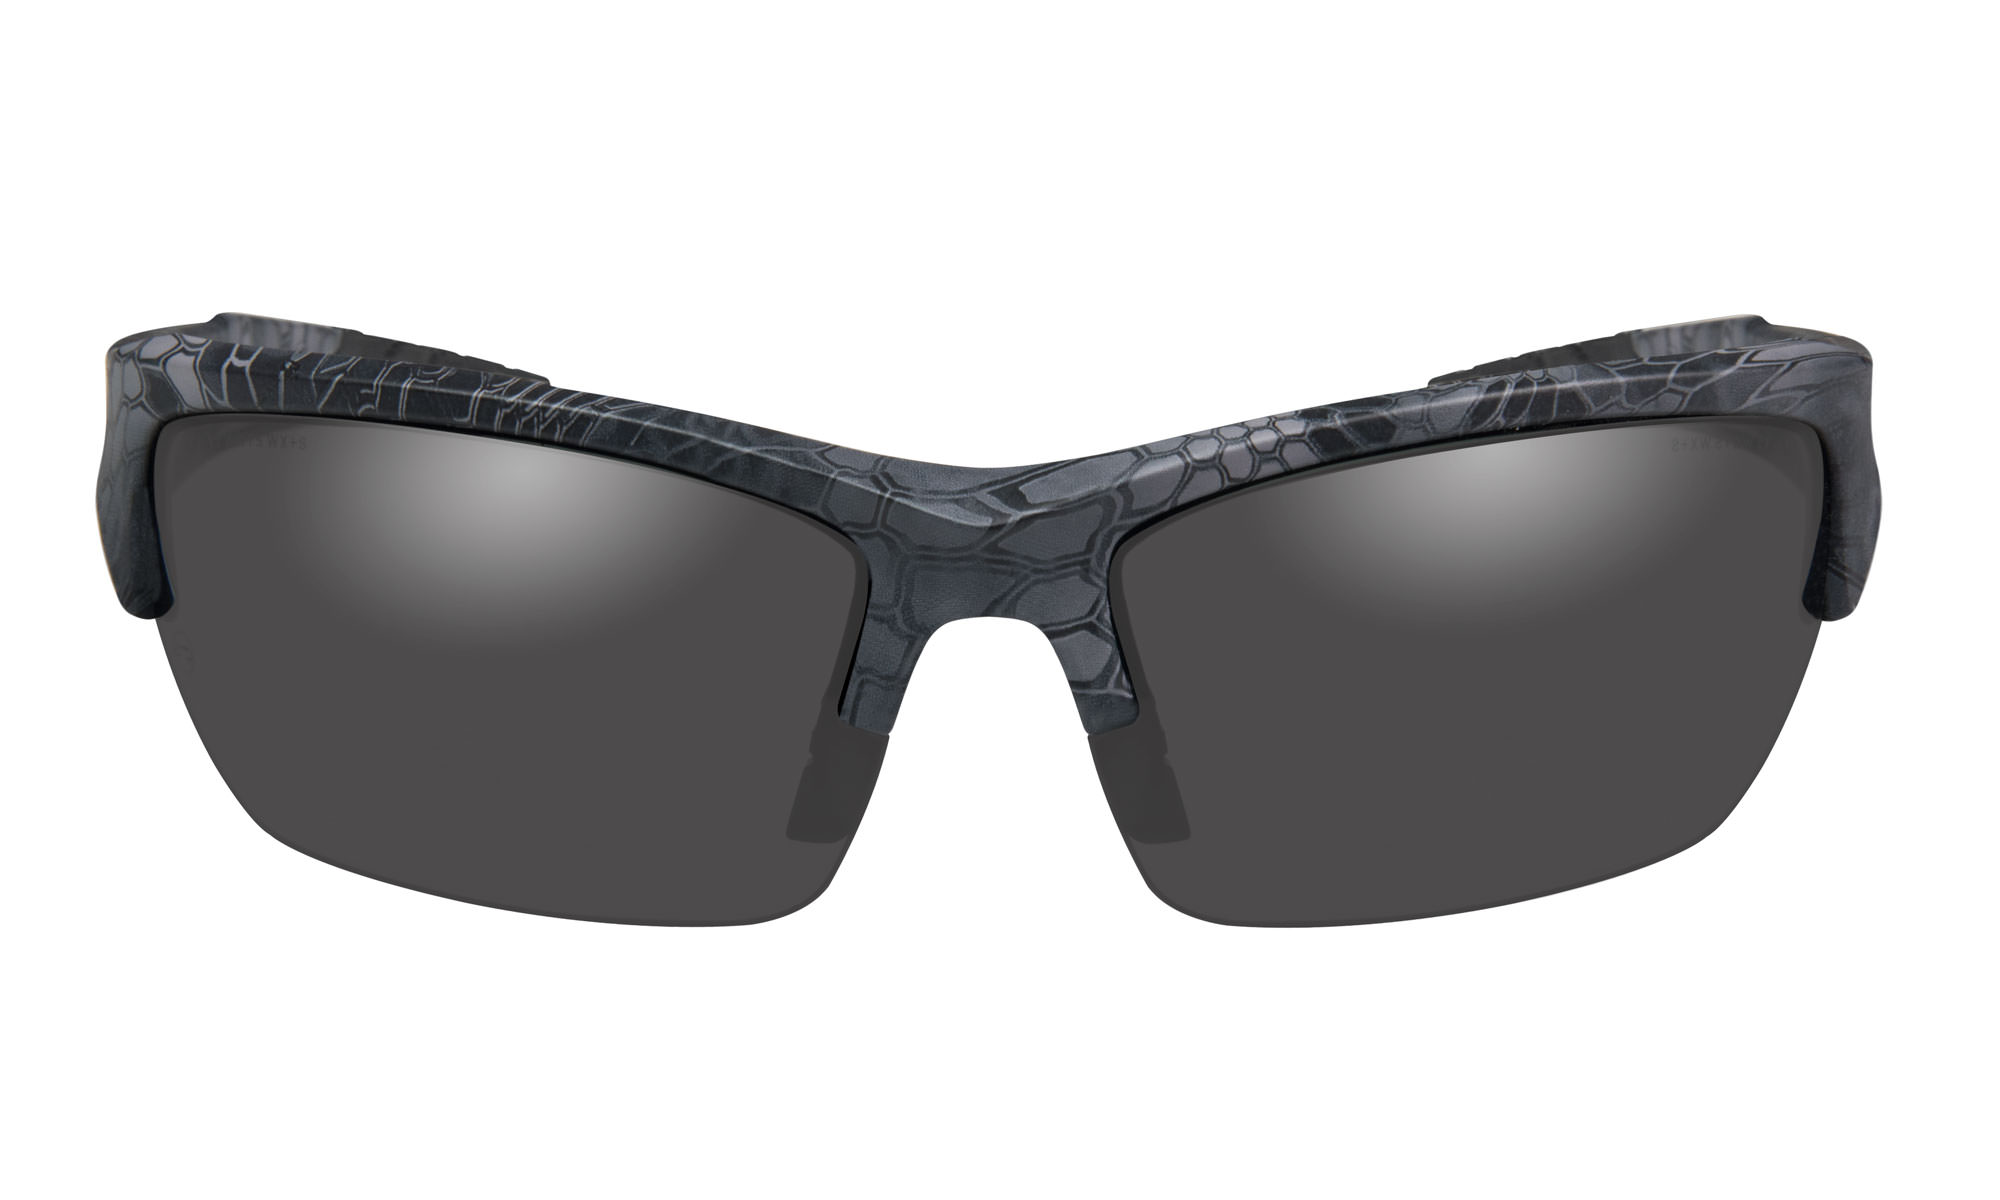 7e8b8b5d3b9f Wiley-X WX Valor Kryptek® Typhon™ with Polarized Smoke Grey Lenses ...